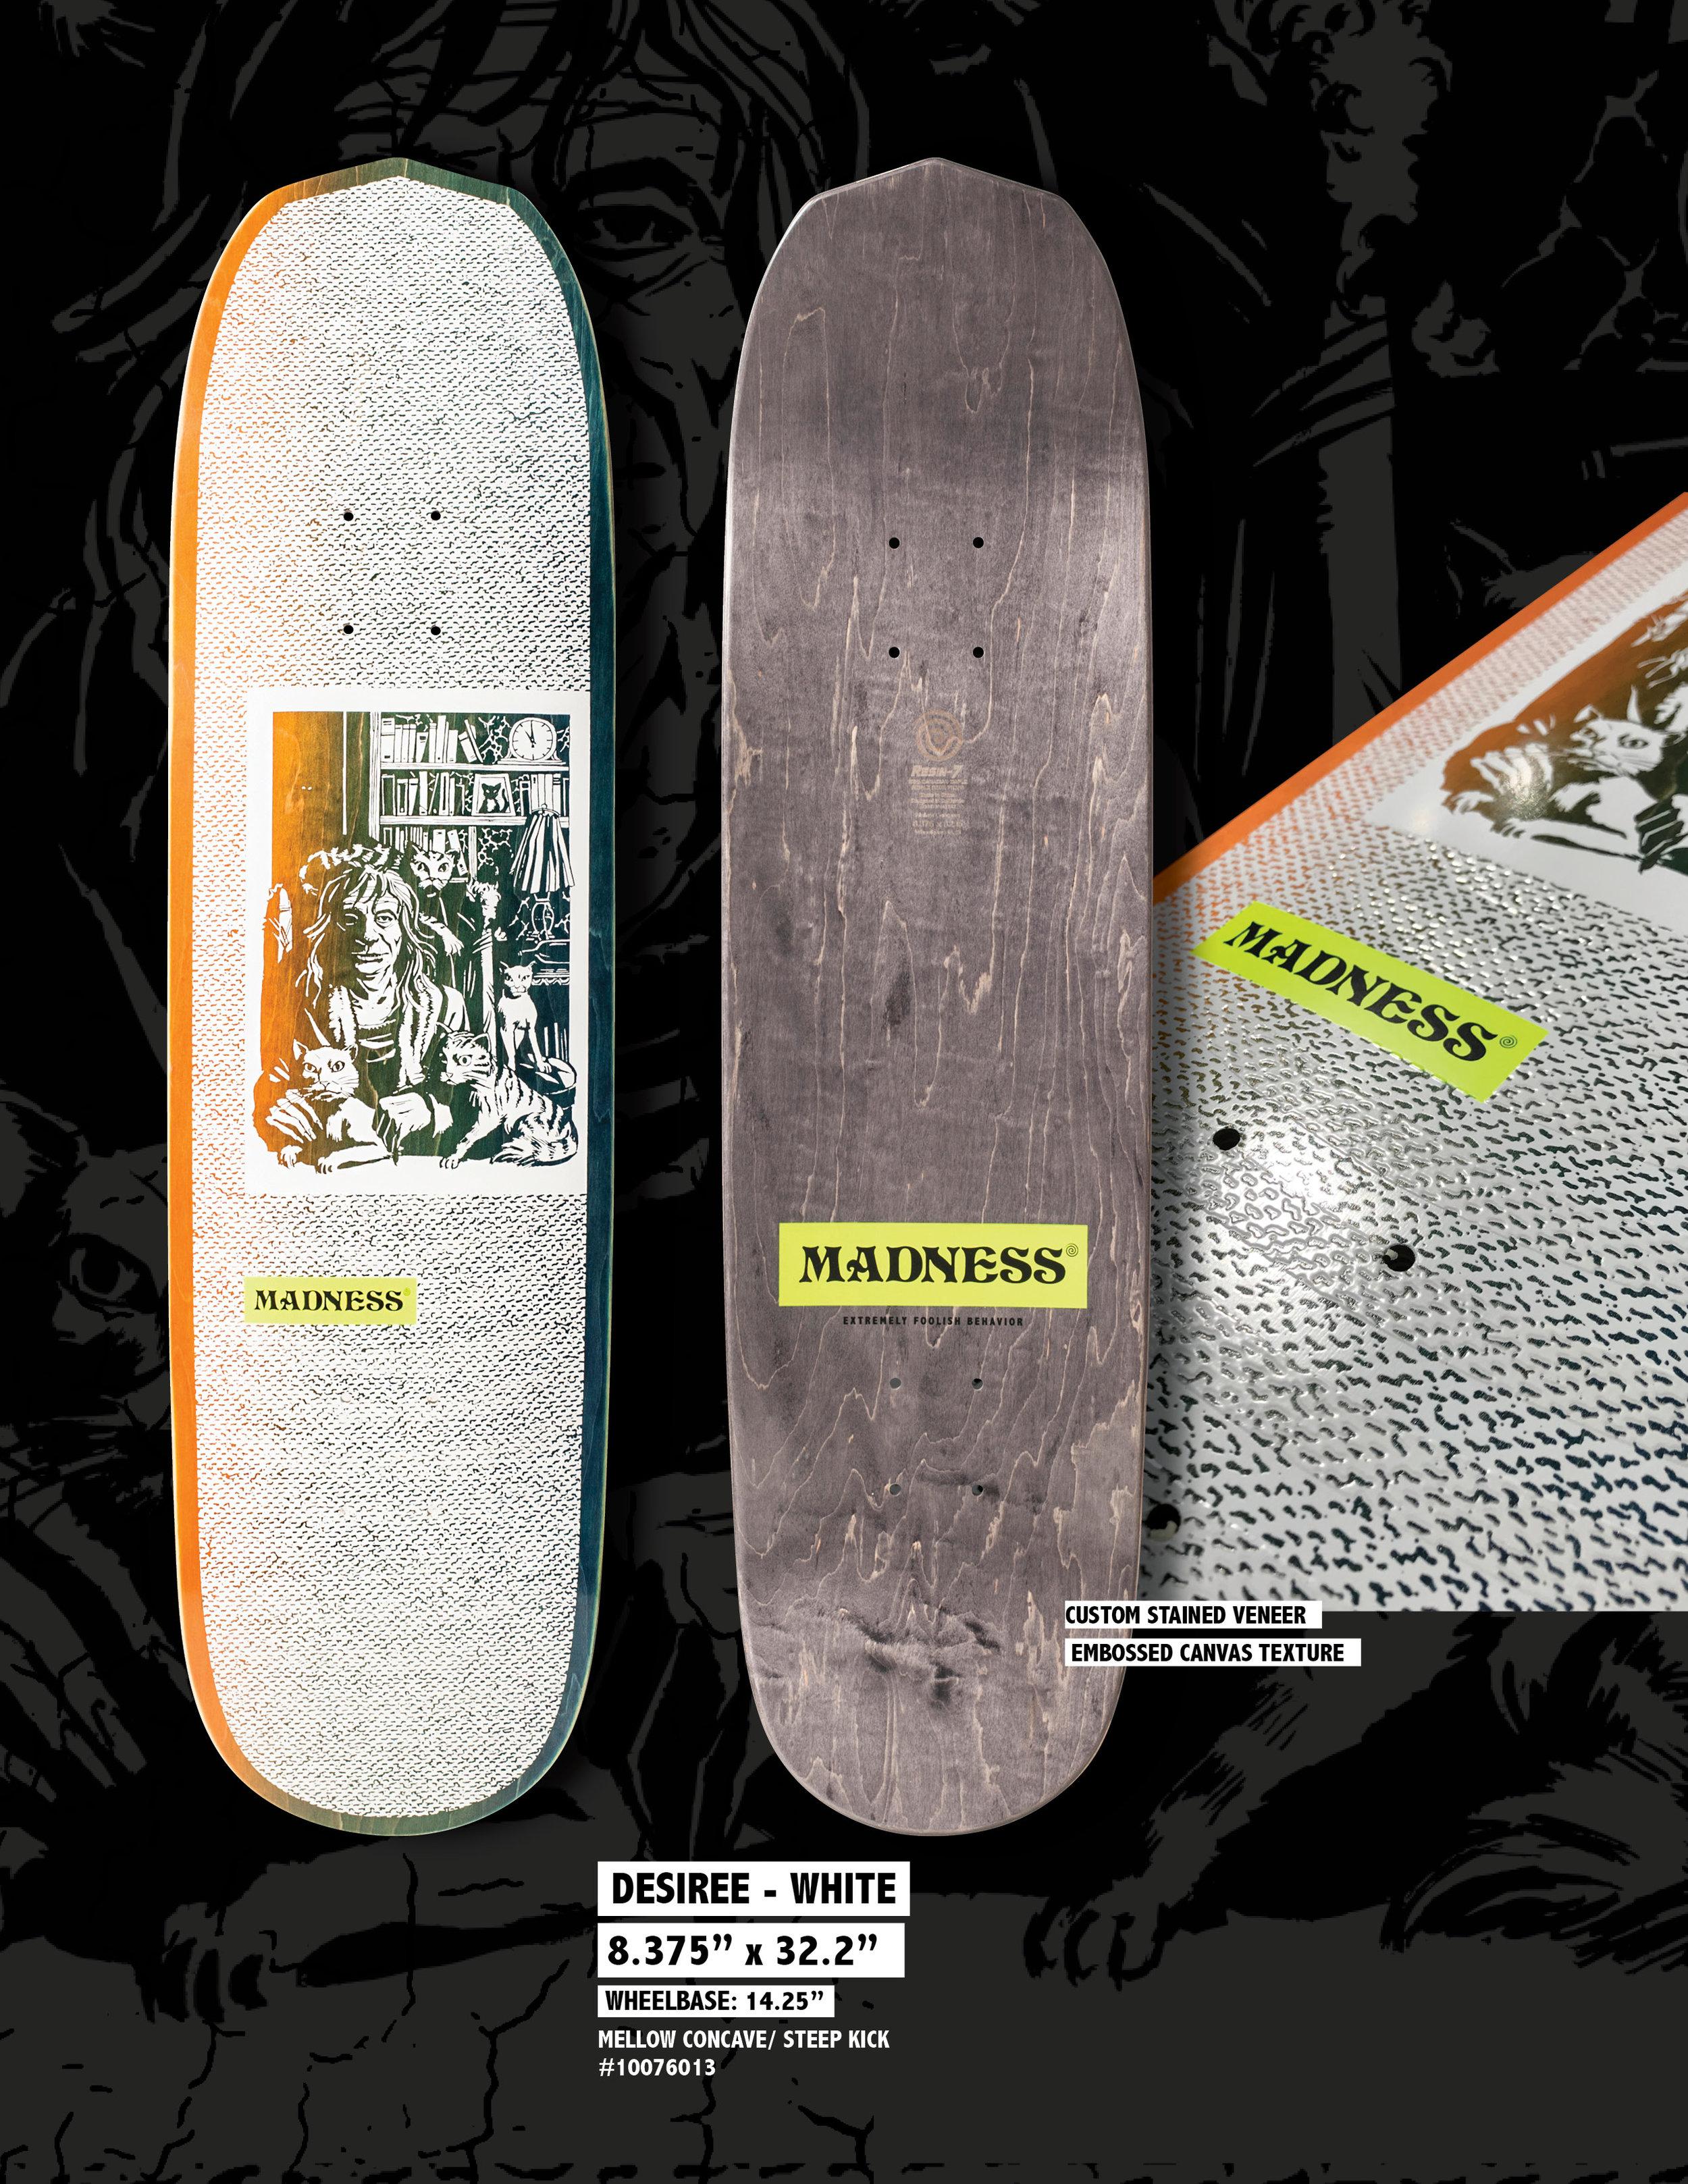 Madness_Spring_1916_Desiree_Skateboard_Deck.jpg